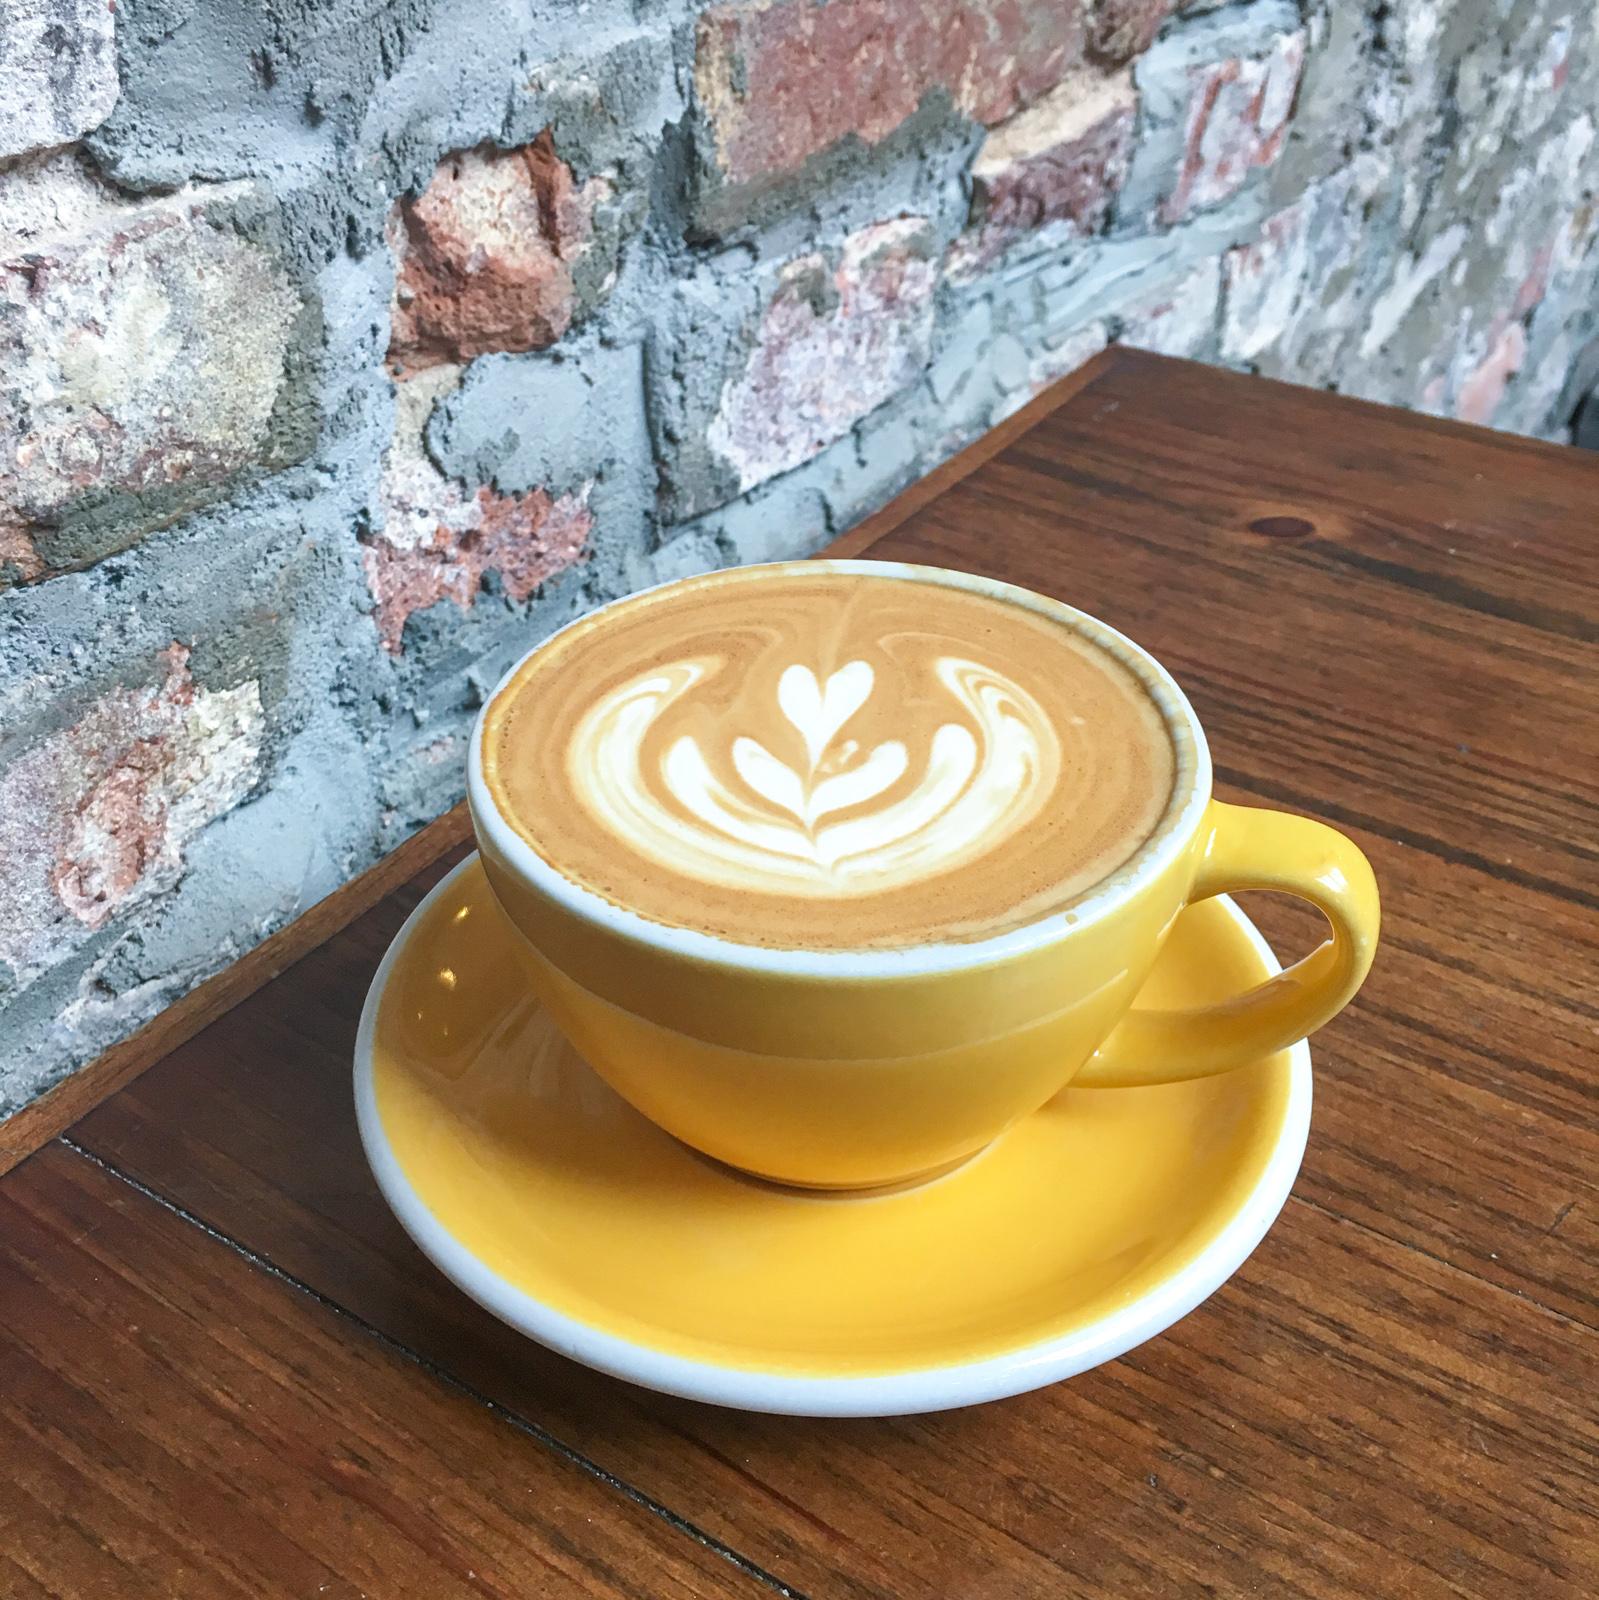 Colombiaanse koffie bij Devocion in Williamsburg, Brooklyn